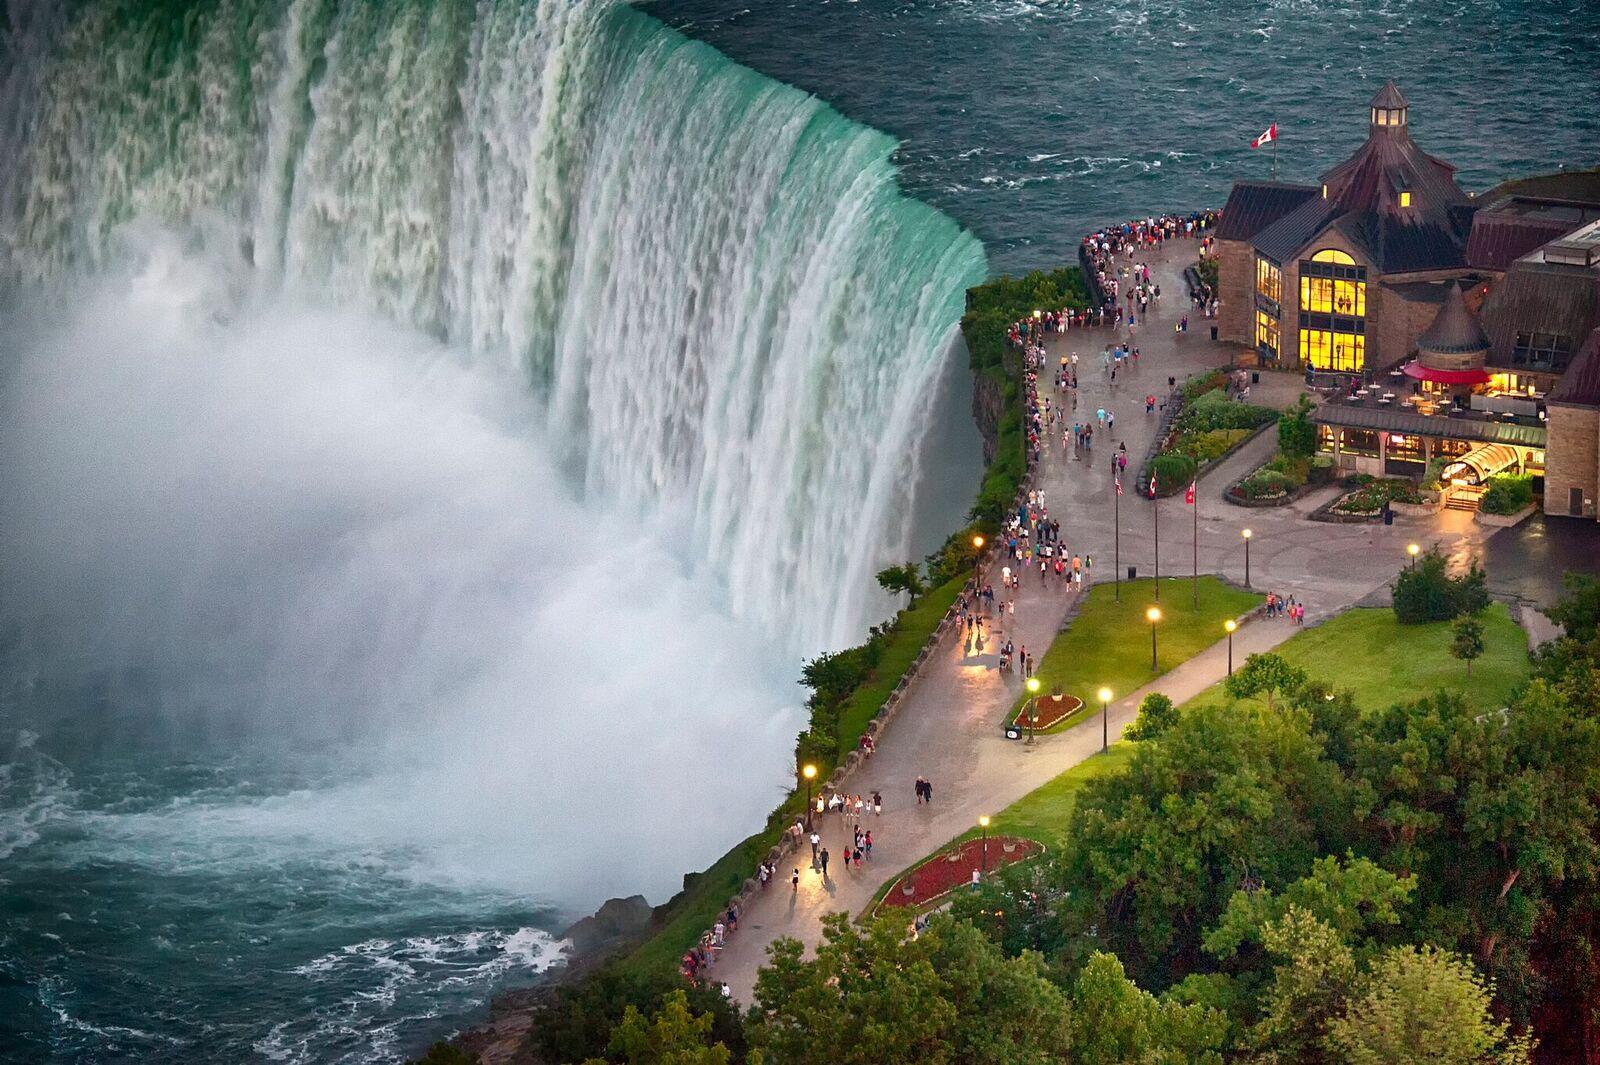 Man survives being swept over Niagara Falls